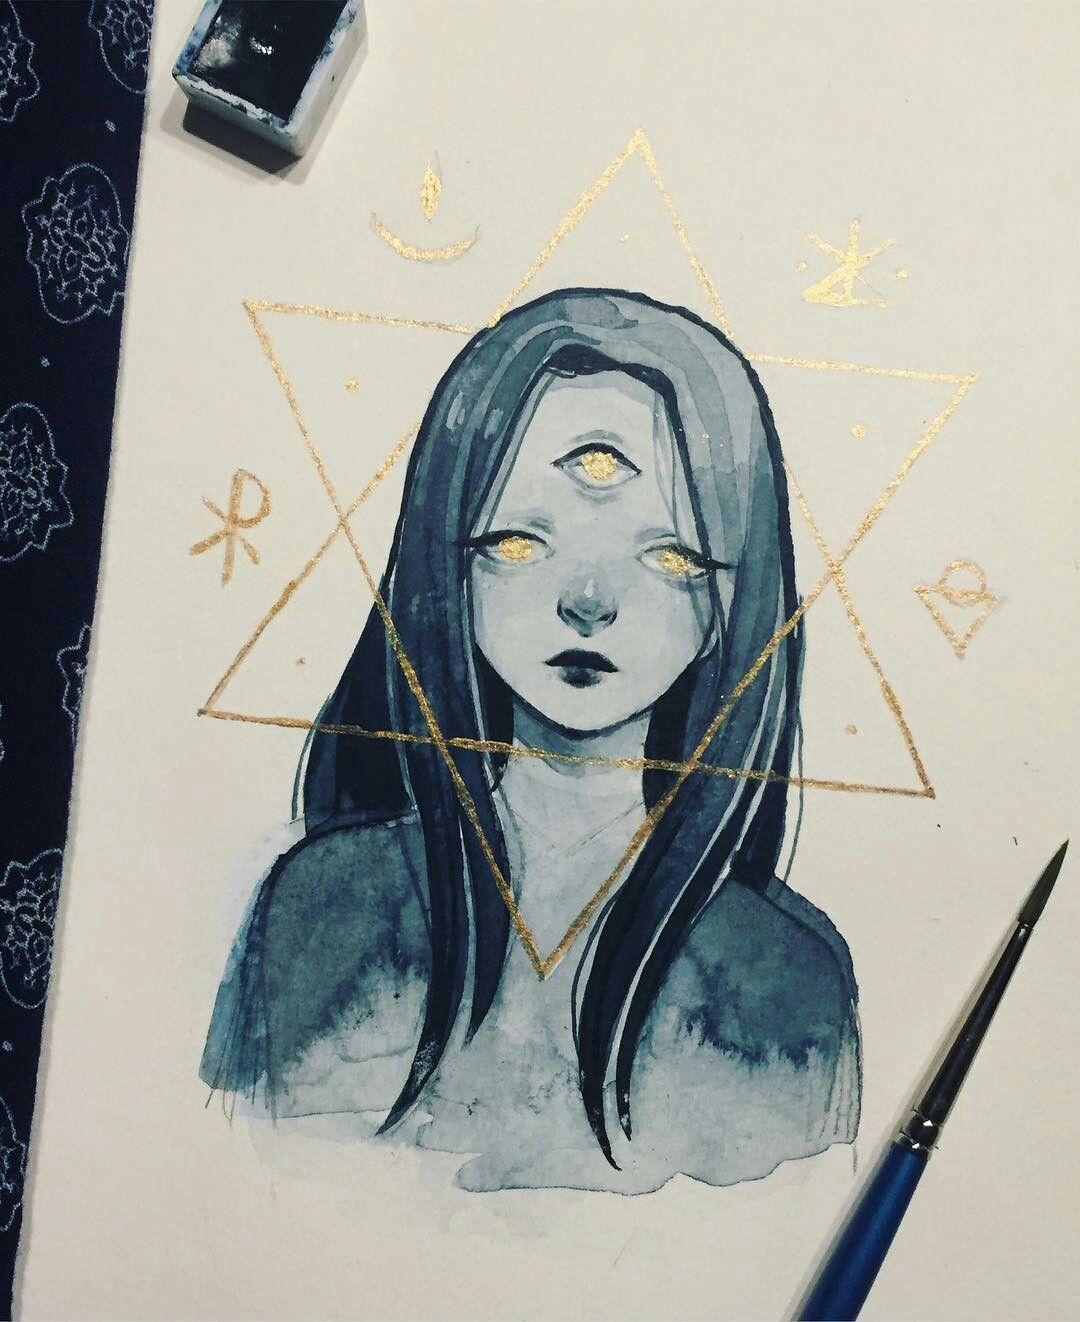 Pin de Maria Victoria en CUTIES | Pinterest | Dibujo, Ilustraciones ...